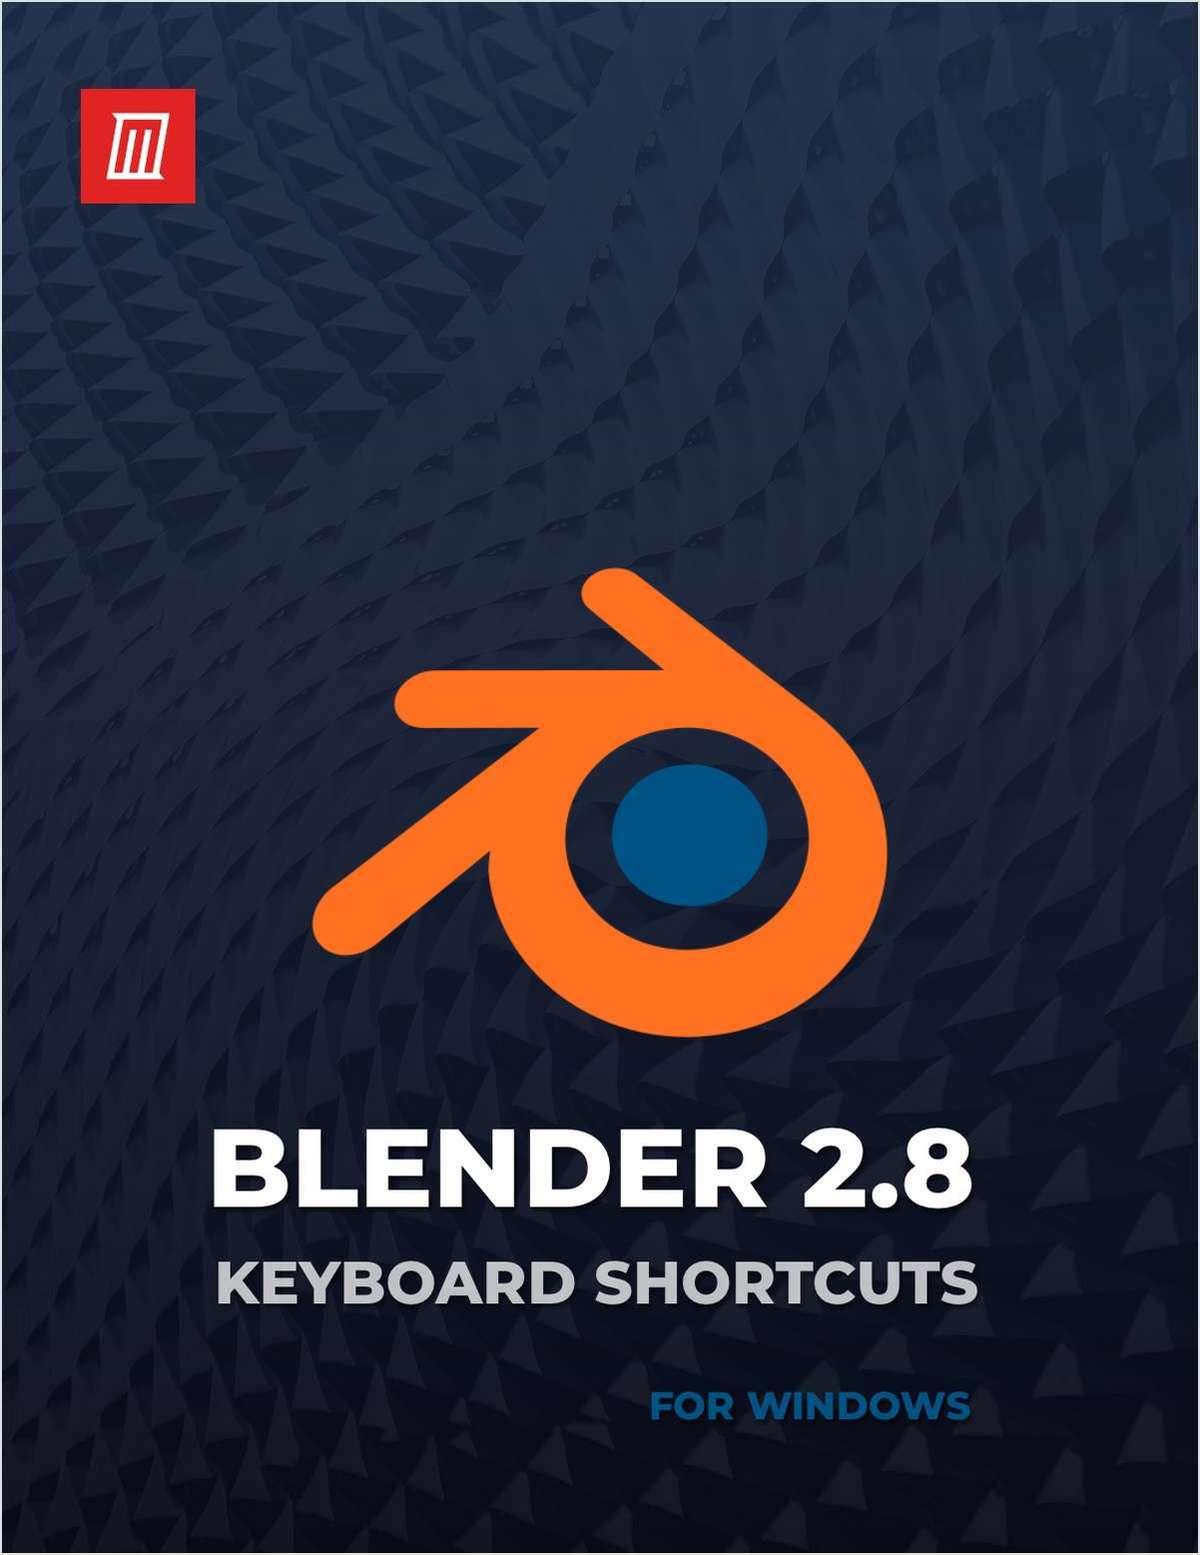 Blender 2.8 Keyboard Shortcuts for Windows